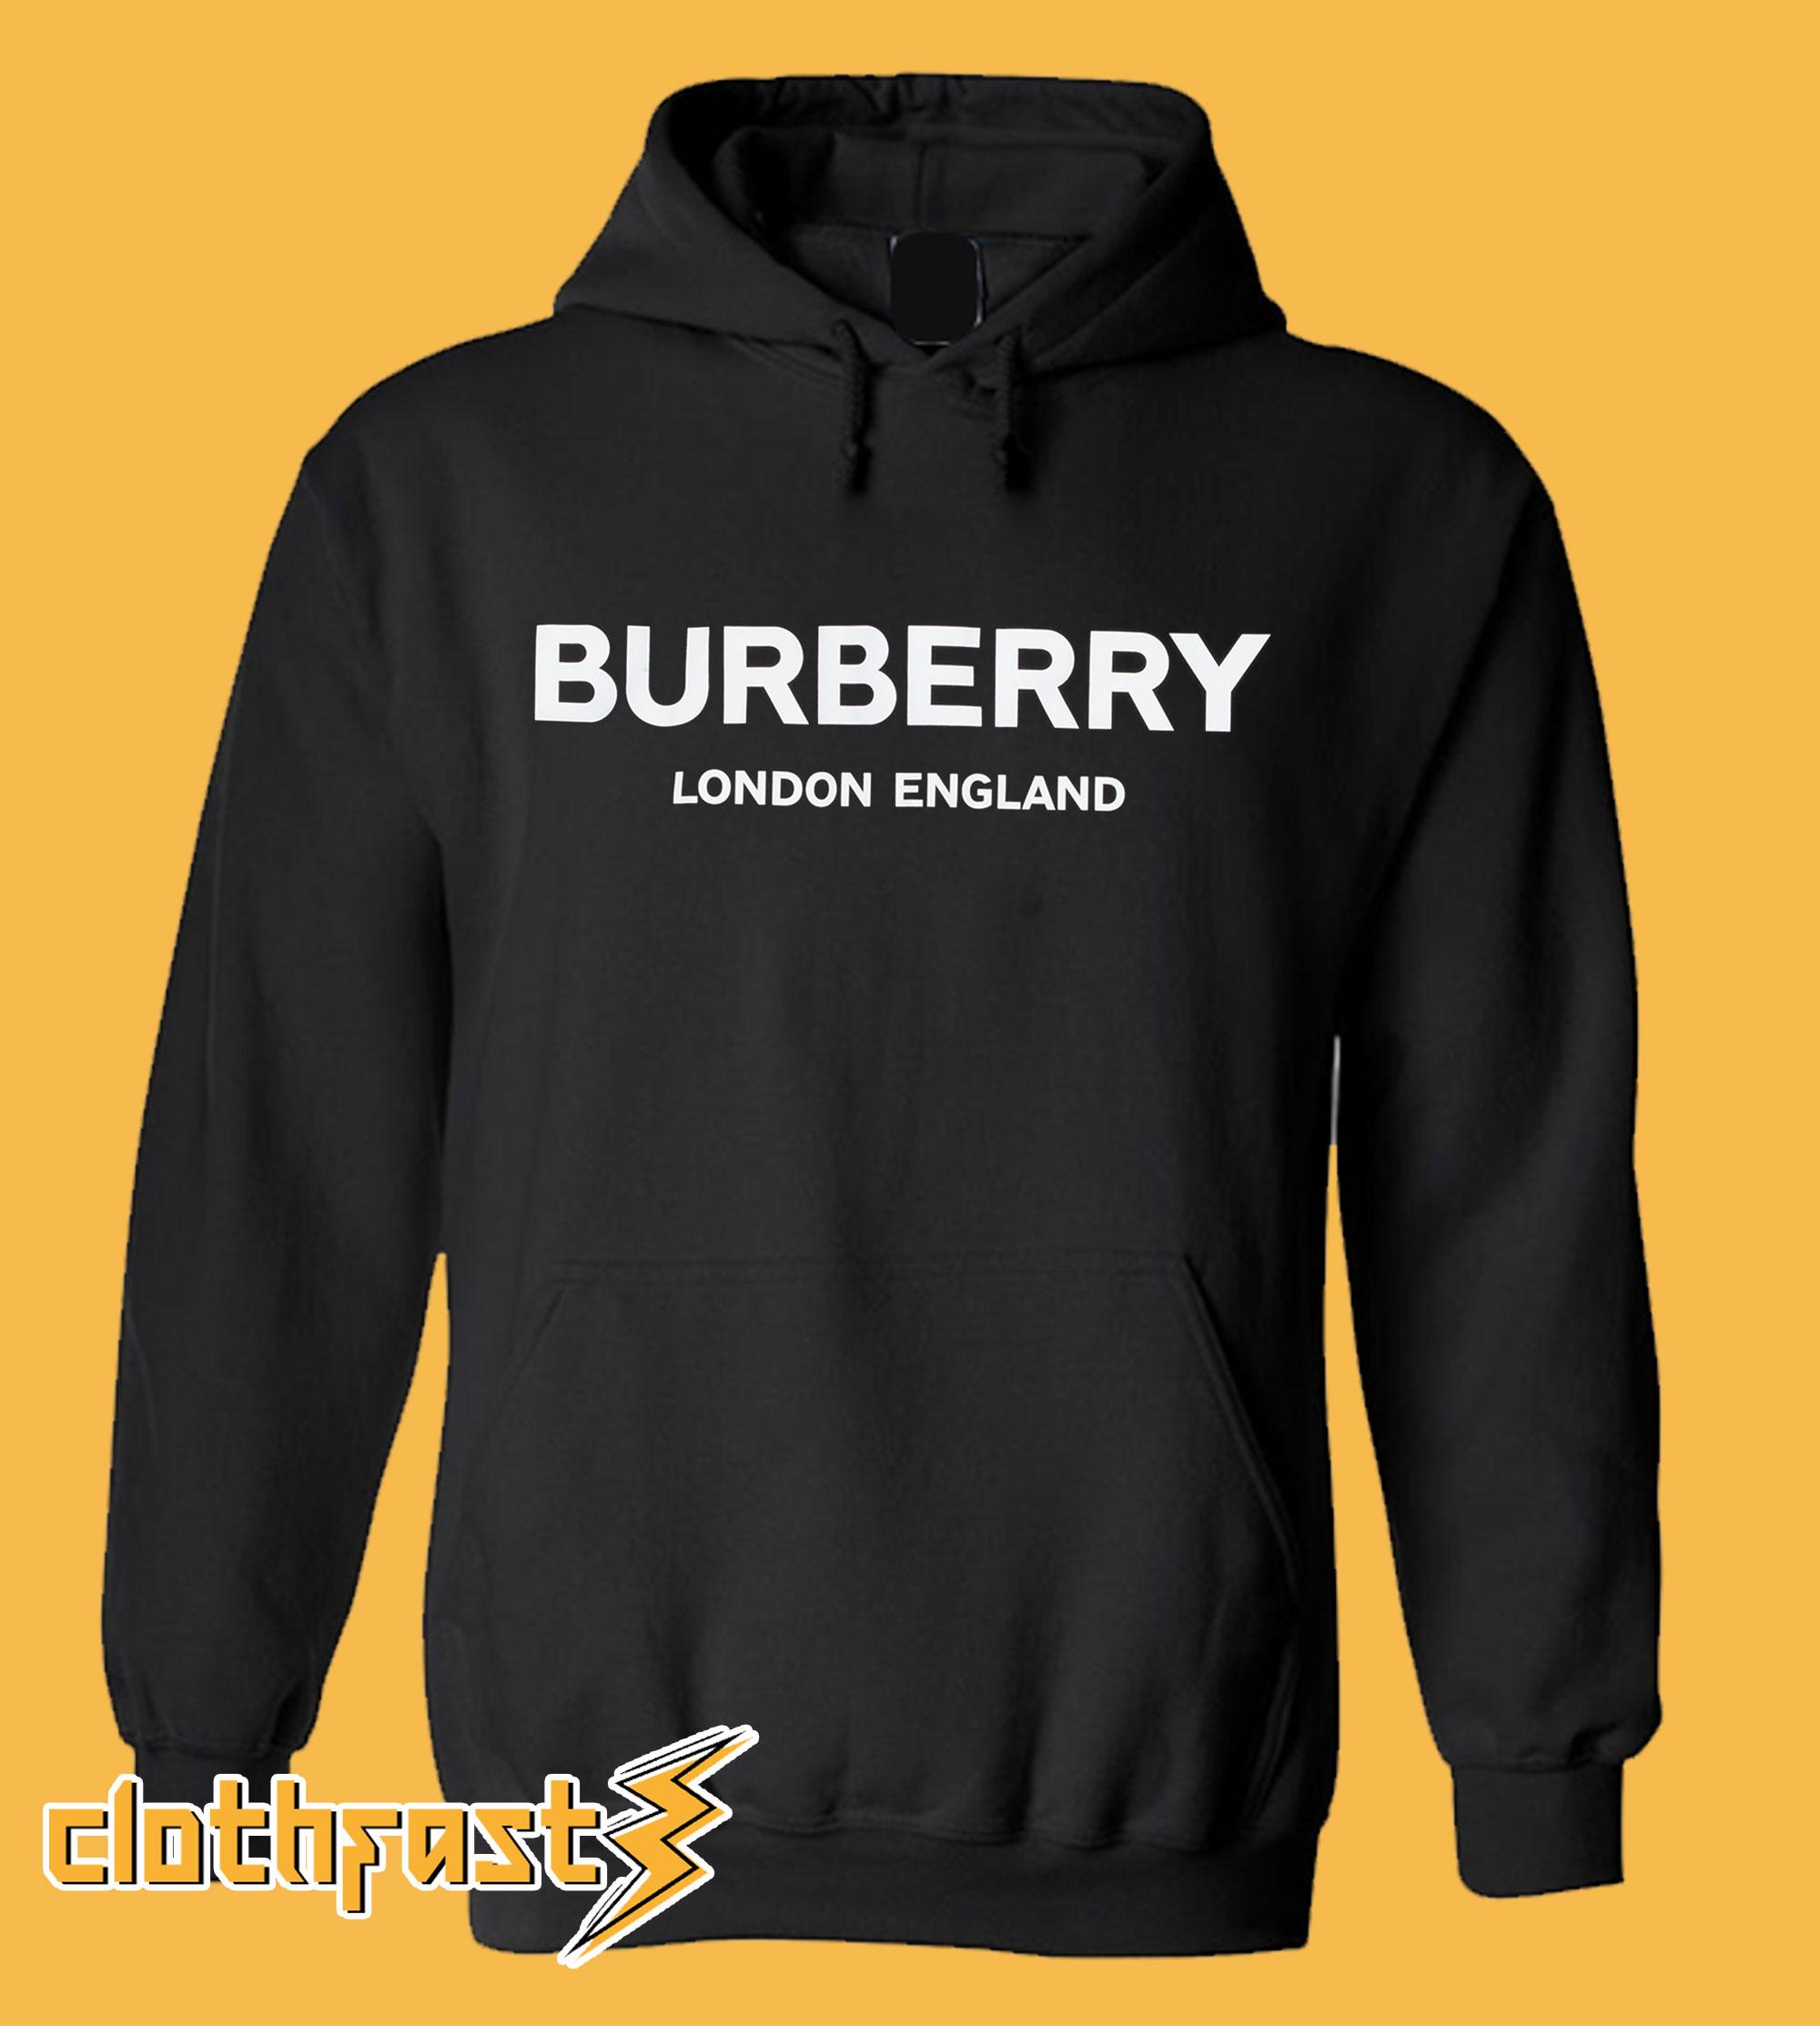 Burberry London England Hoodie